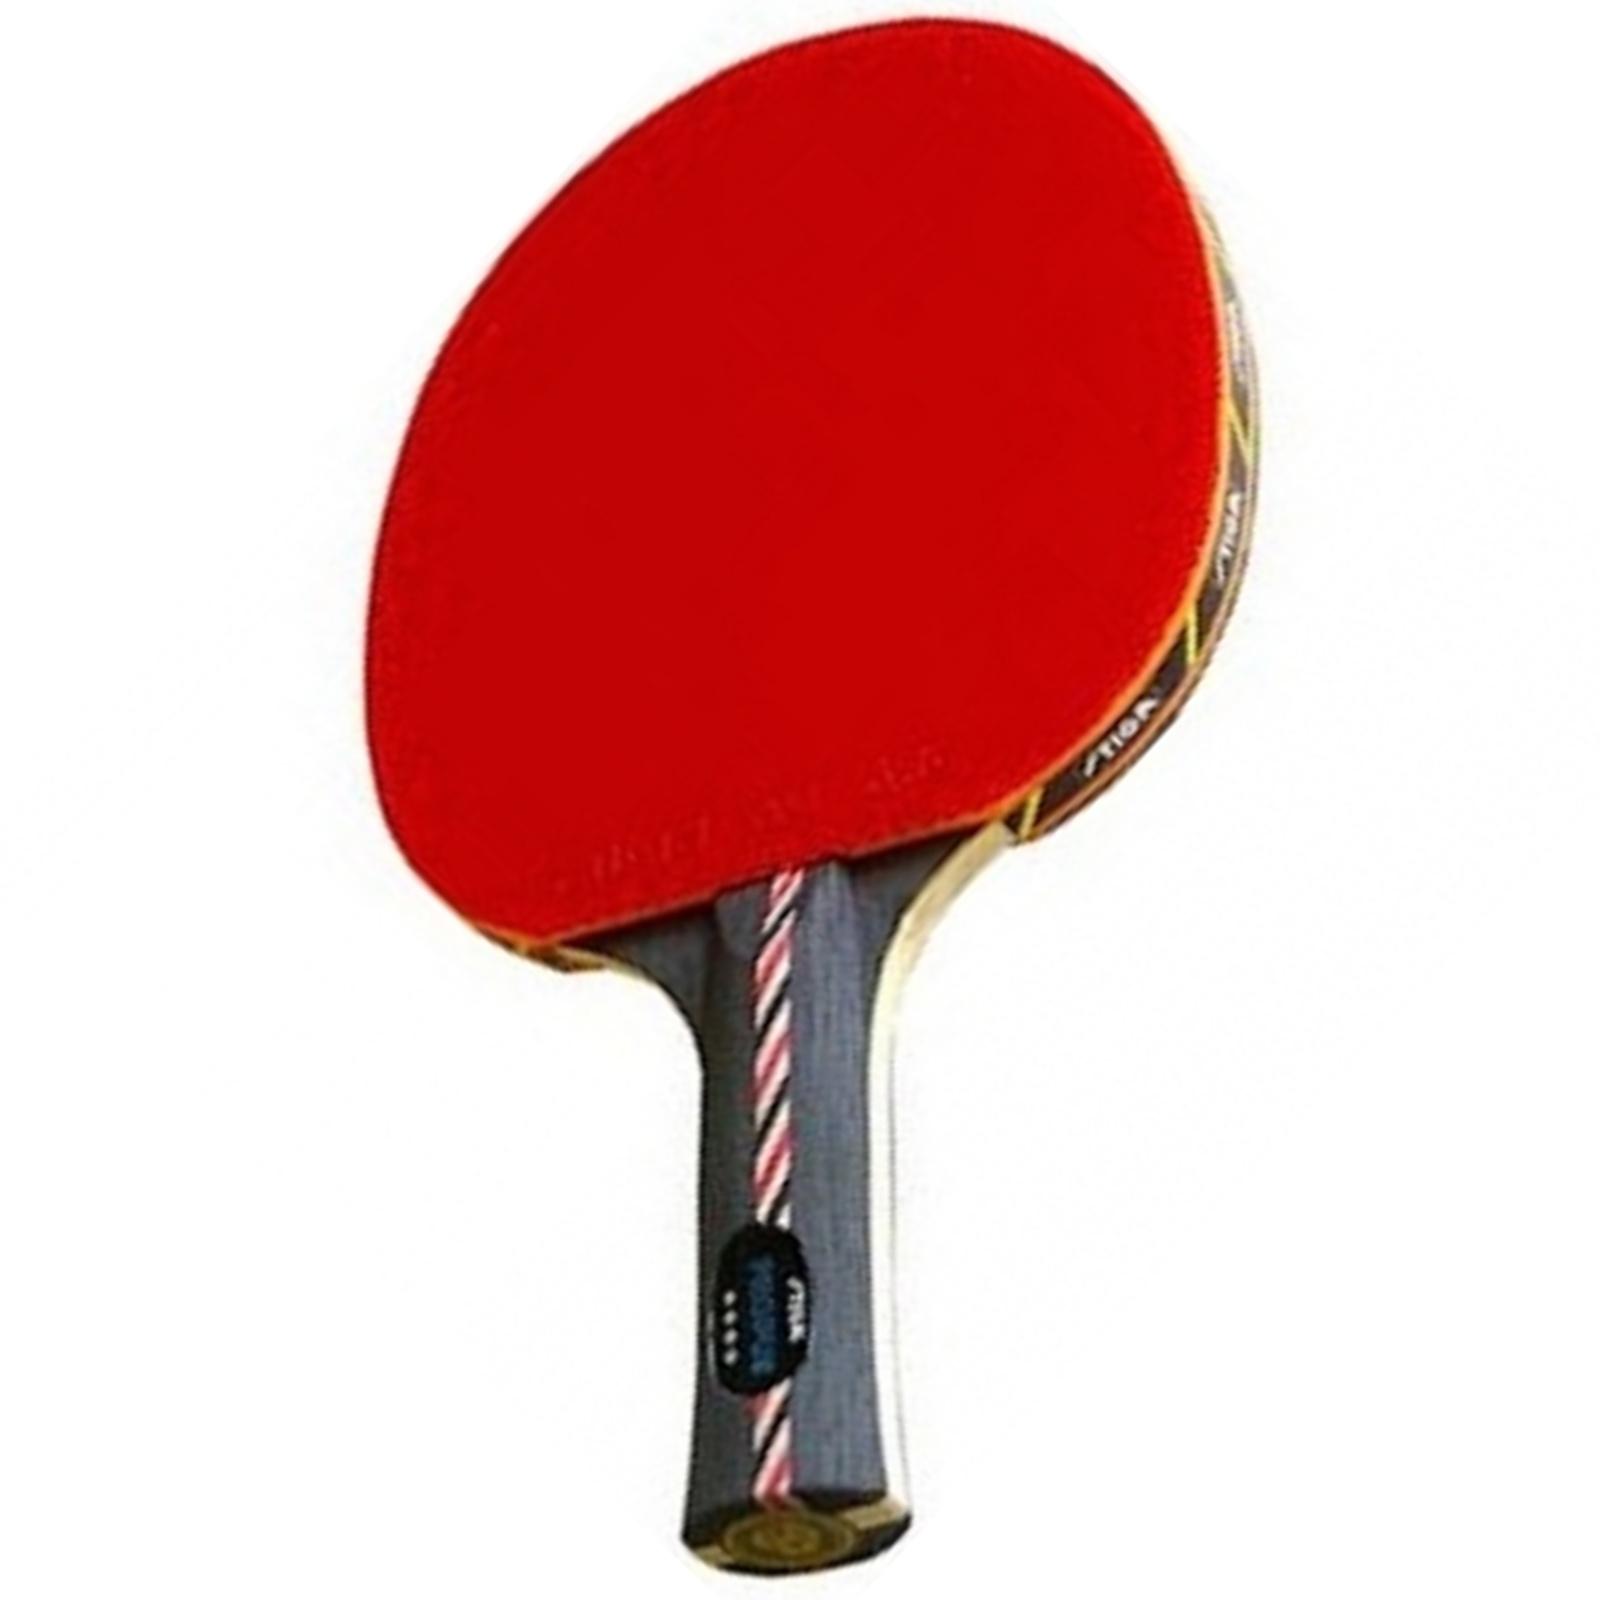 Pálka na stolní tenis STIGA Procyon